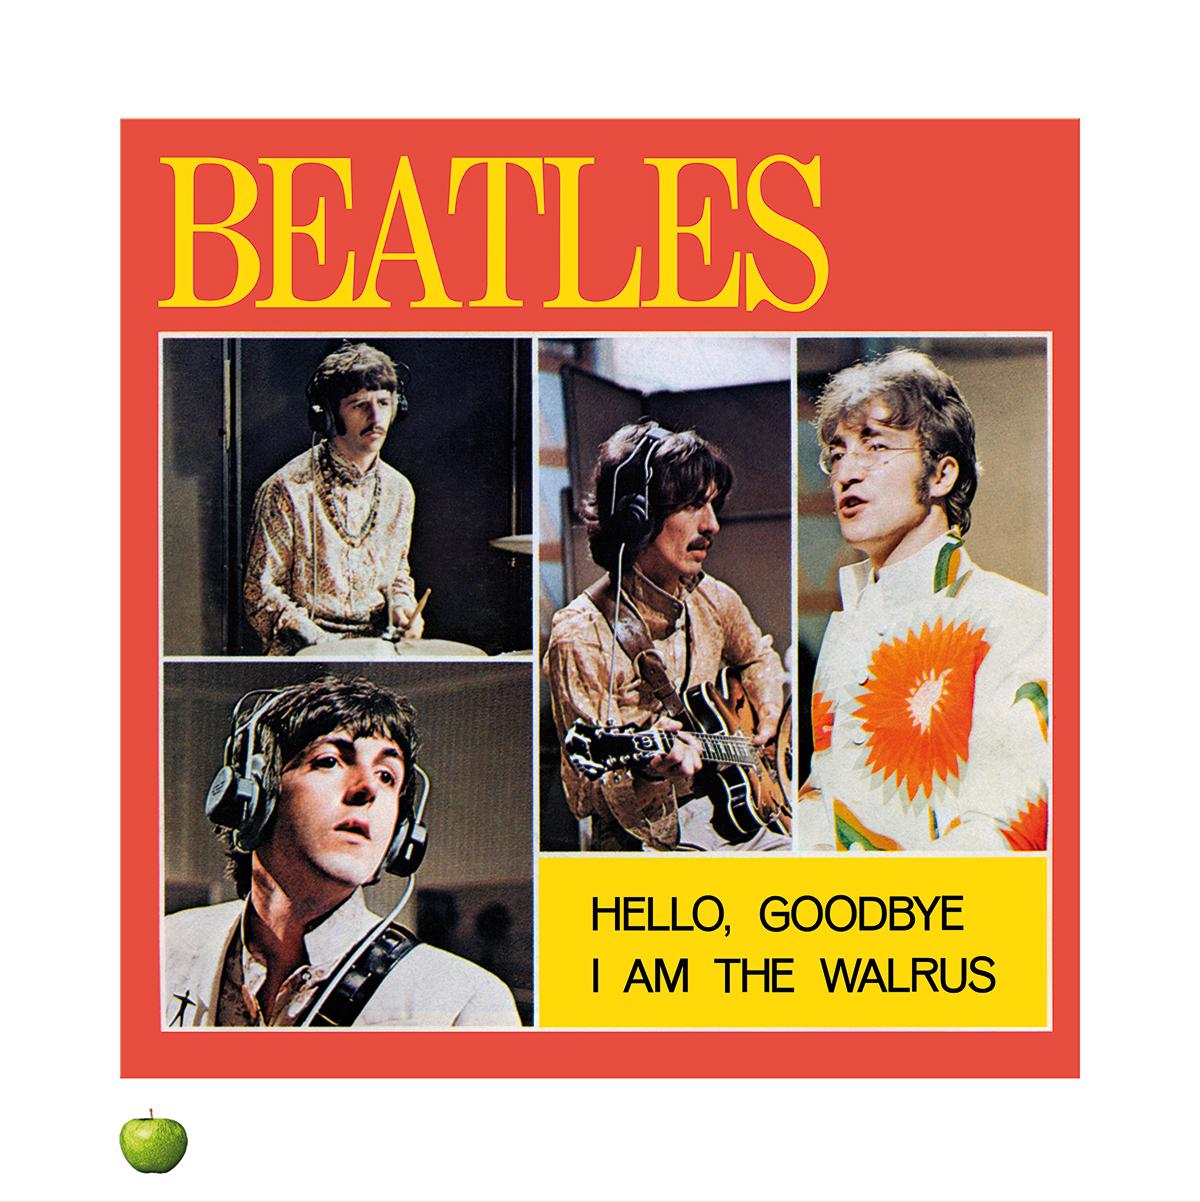 Hello Goodbye Version 2 Lithograph